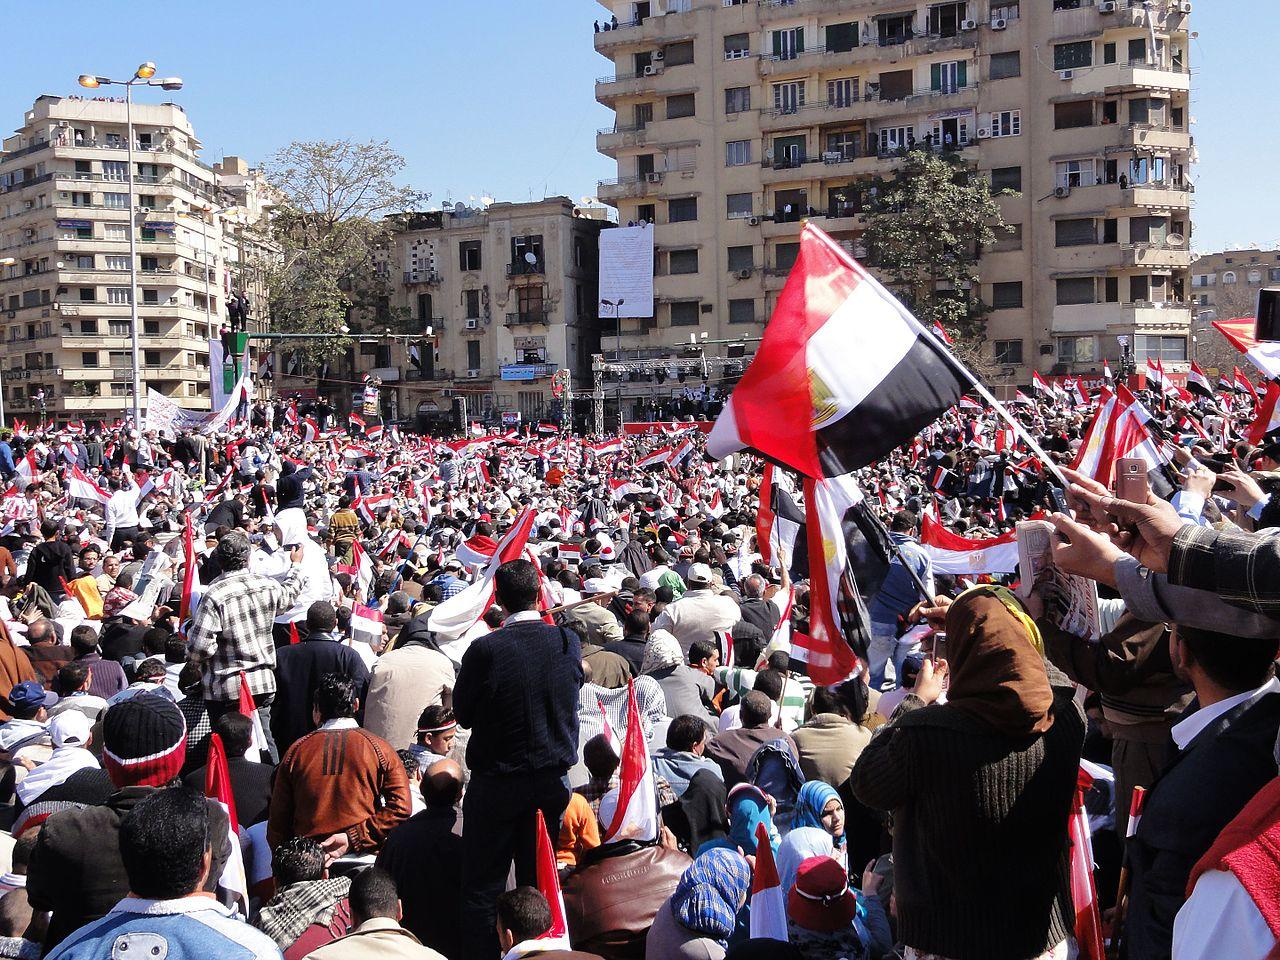 Arab Spring fallout in Egypt spurs spiritual change